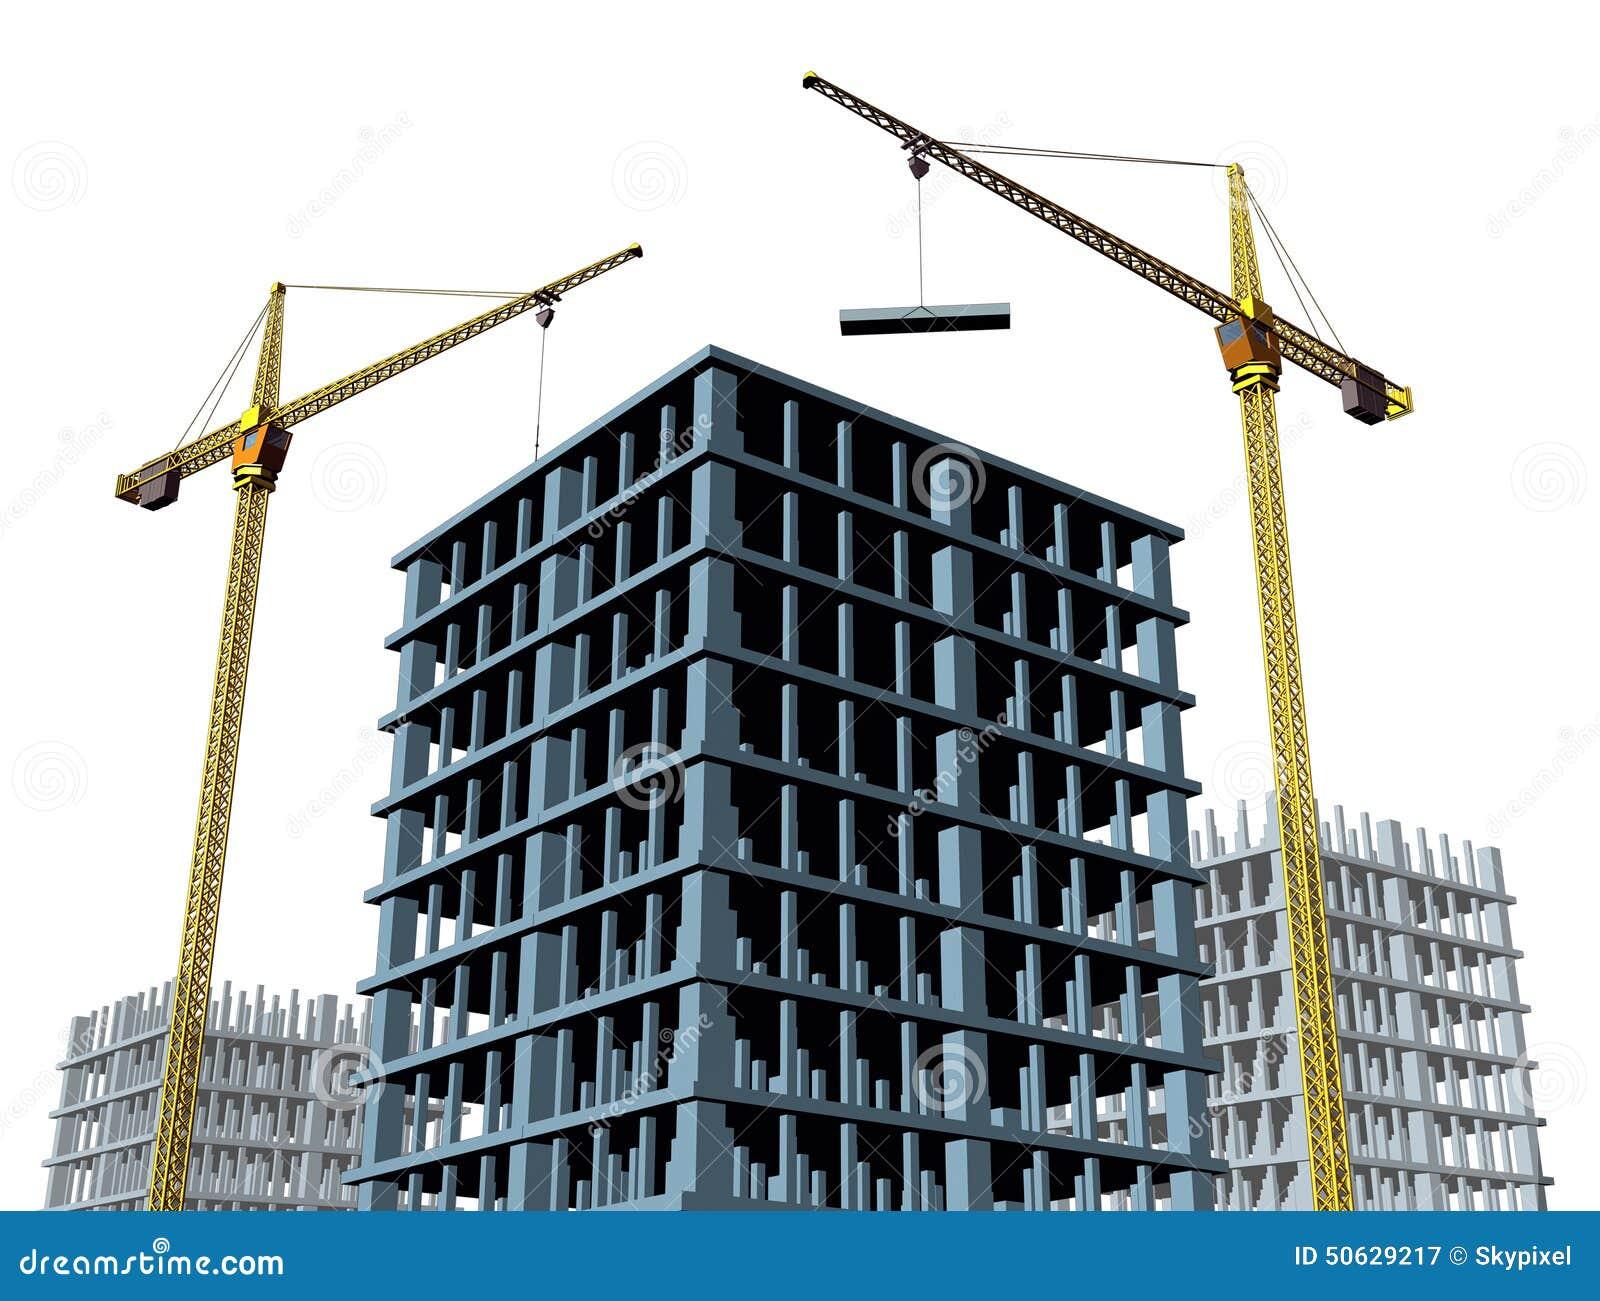 Building Construction Clip Art : Highrise construction site stock illustration